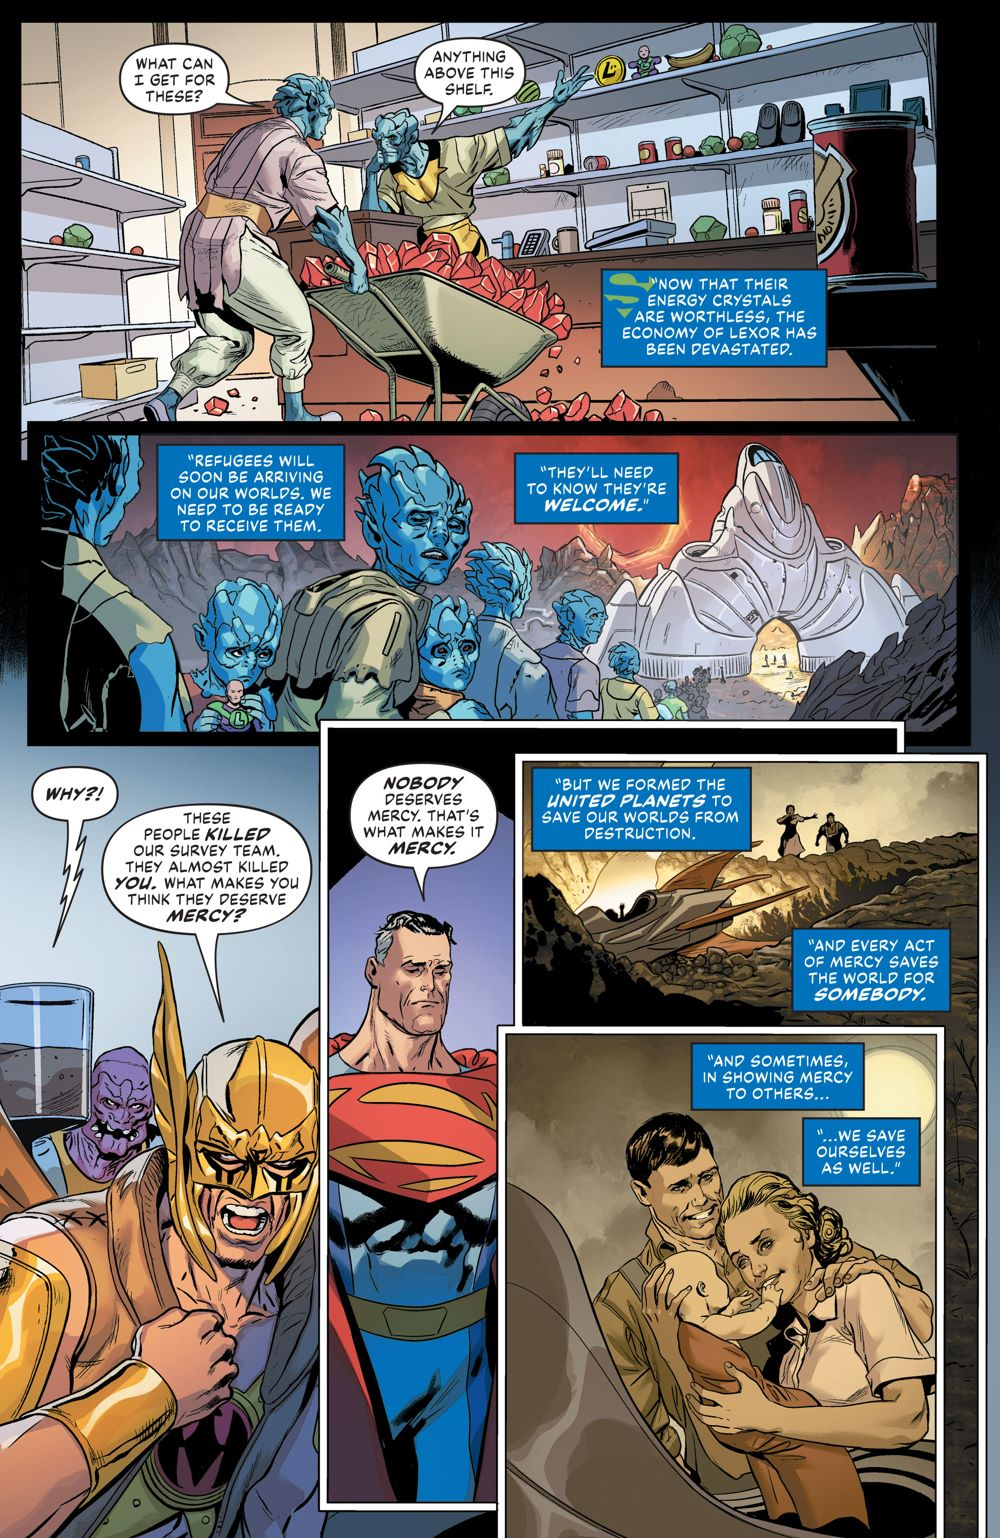 Future-State-Superman-vs-Imperious-Lex-3-3_605d43d0942a01.05153230 ComicList Previews: FUTURE STATE SUPERMAN VS IMPERIOUS LEX #3 (OF 3)